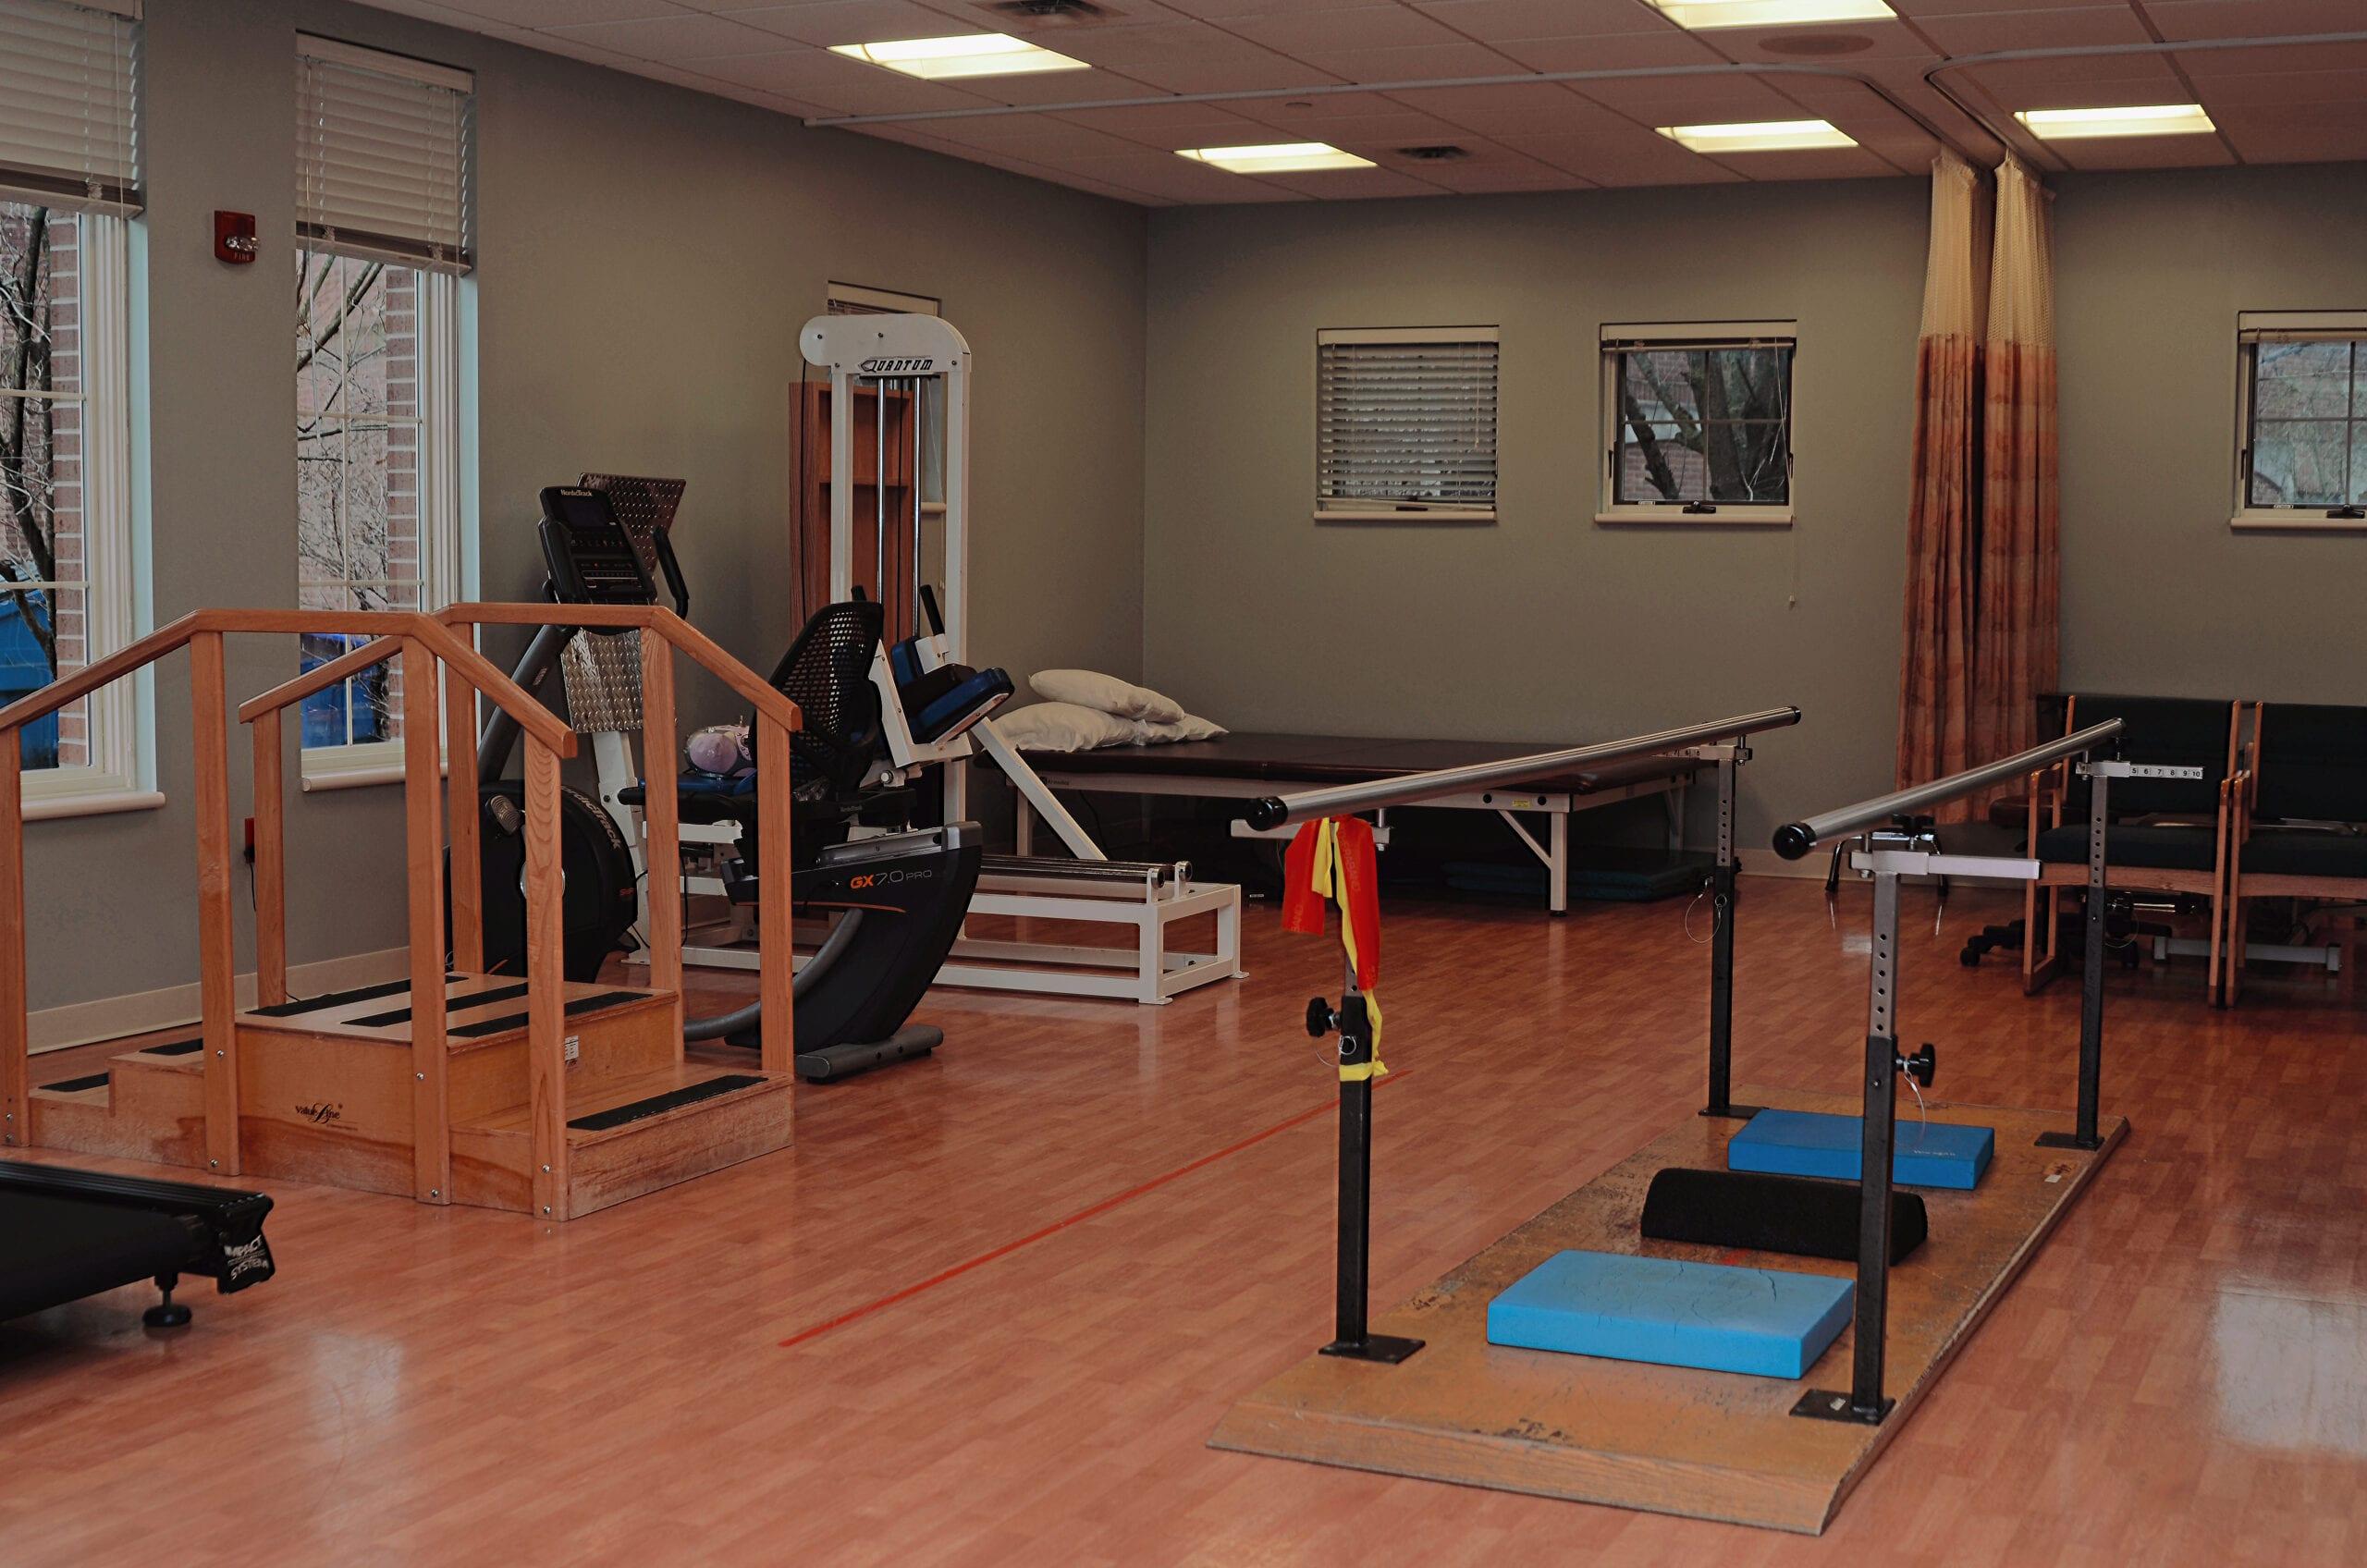 Inpatient and outpatient rehab